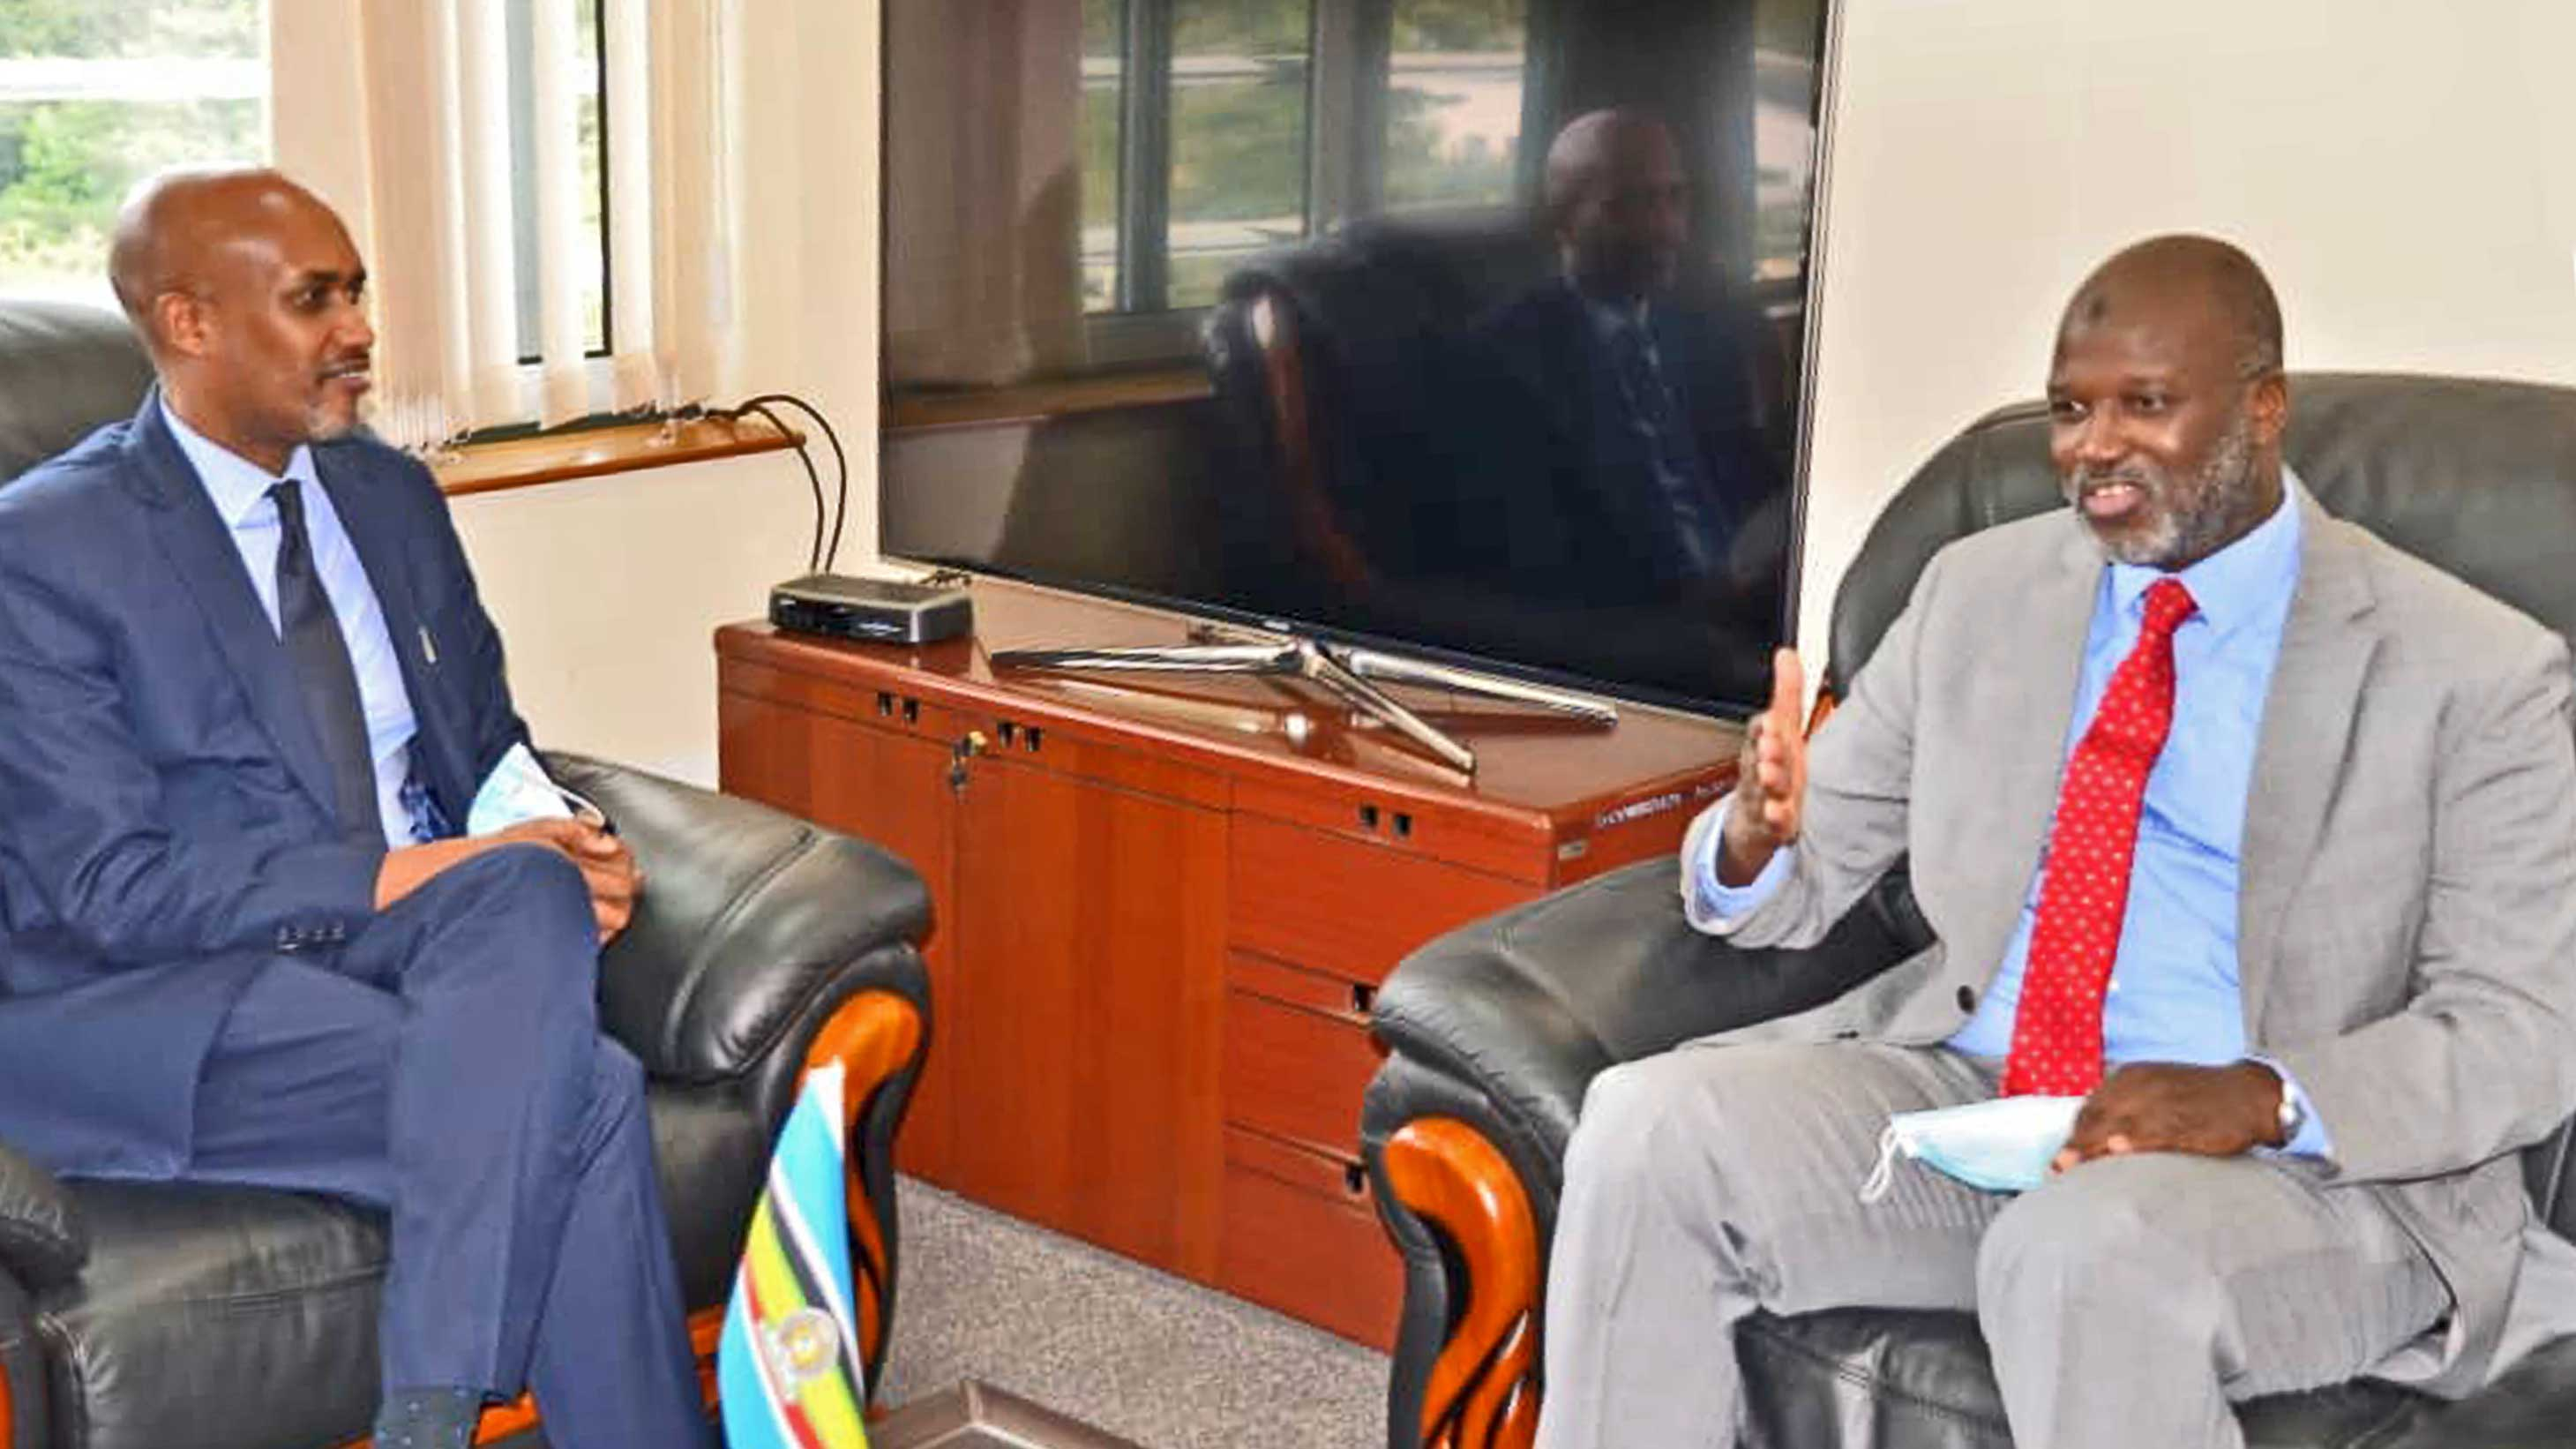 IRMCT Registrar, Mr. Abubacarr Tambadou and Dr. Emmanuel Ugirashebuja, President of the East African Court of Justice.